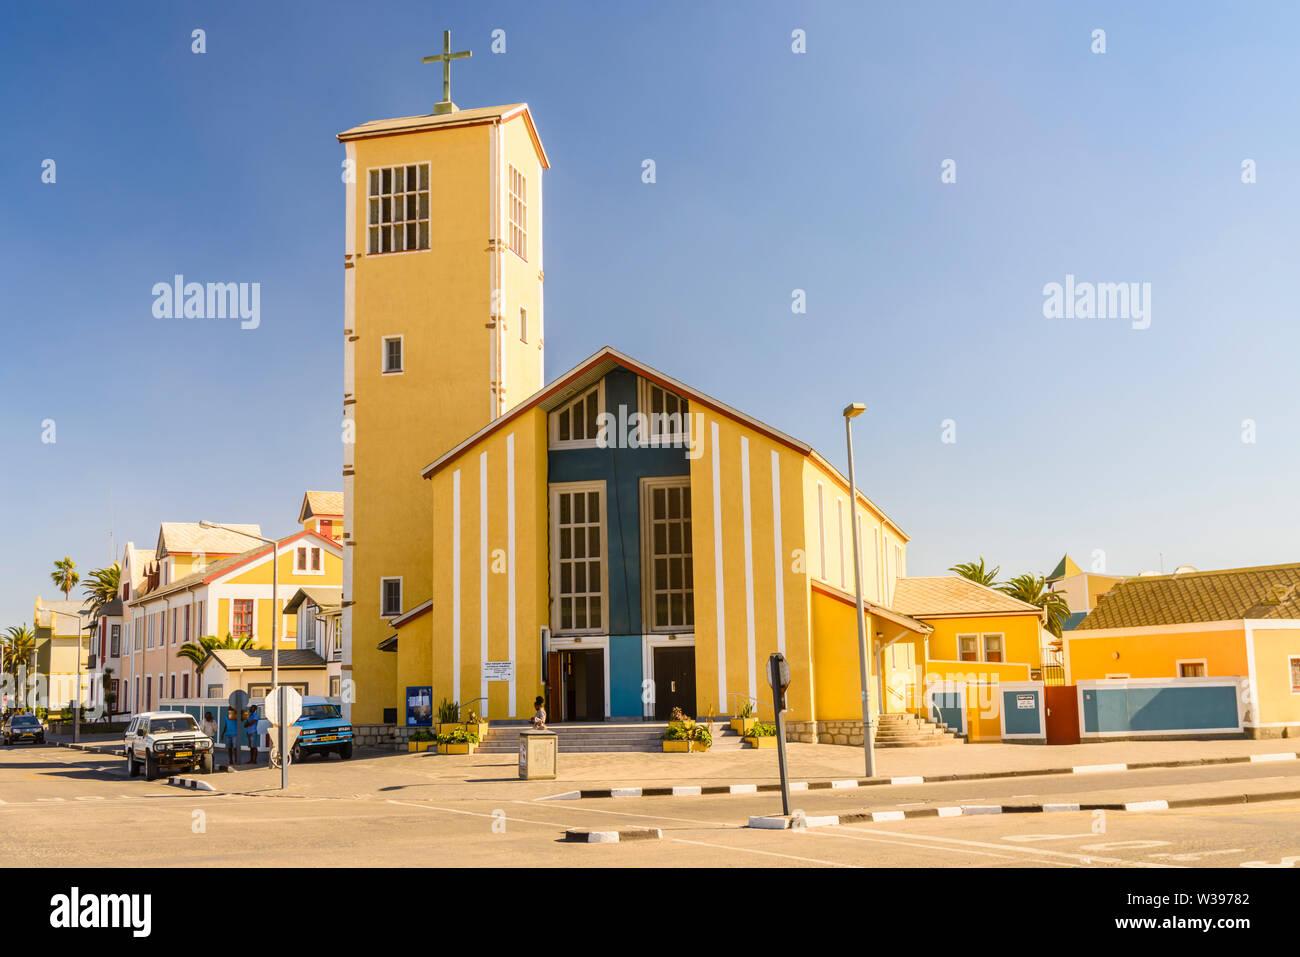 Roman Katholic Church, Daniel Tjongarero Ave, Swakopmund, Namibia Stock Photo